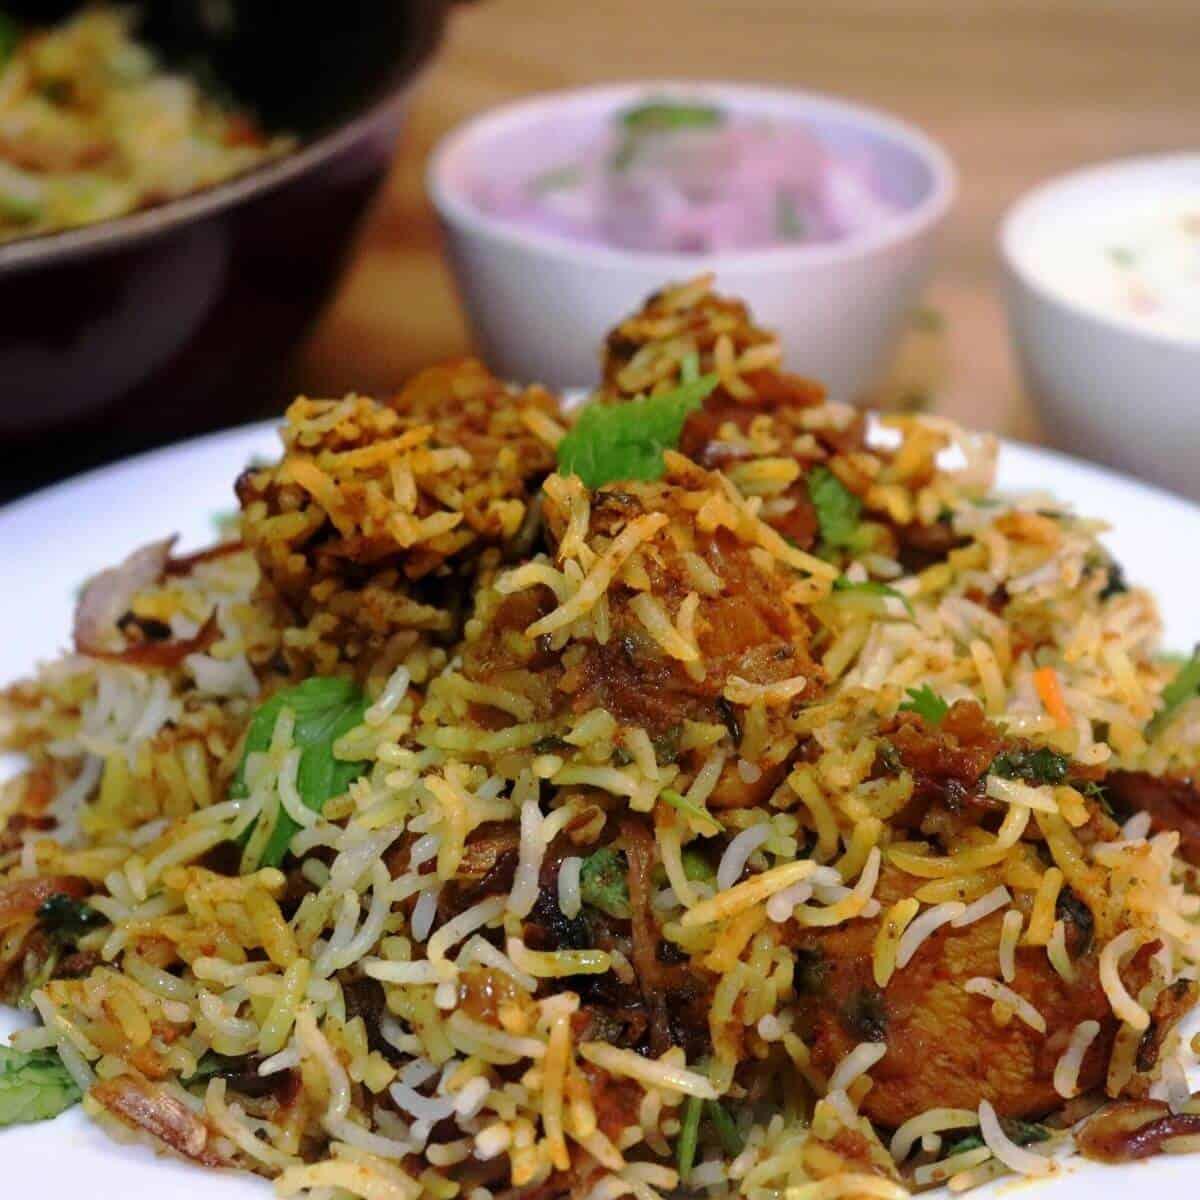 hyderabadi chicken dum biryani served on a white plate with raita & salad.